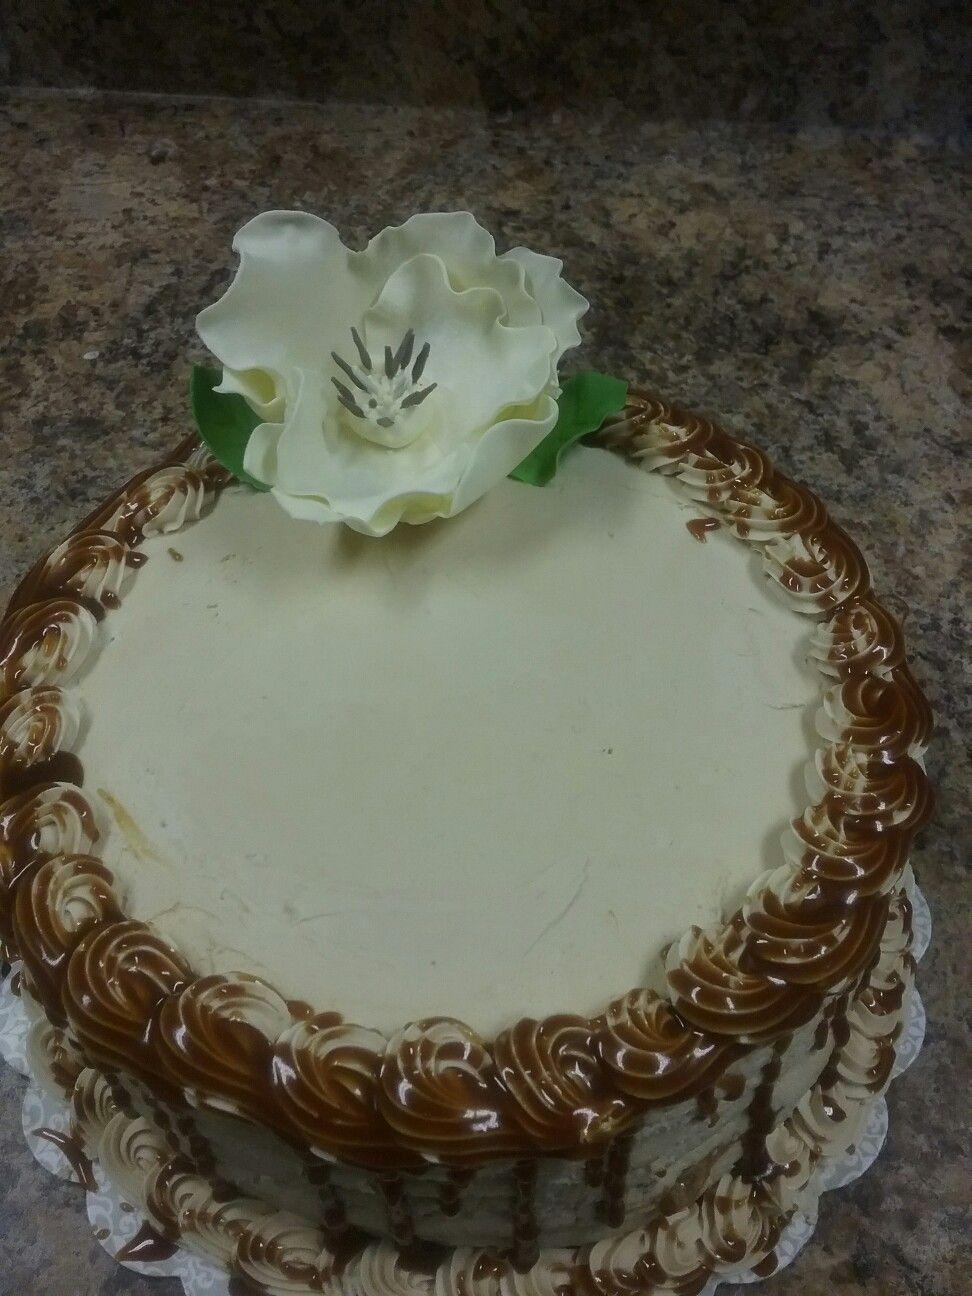 Freash banana pound cake with homemade caramel sauce and